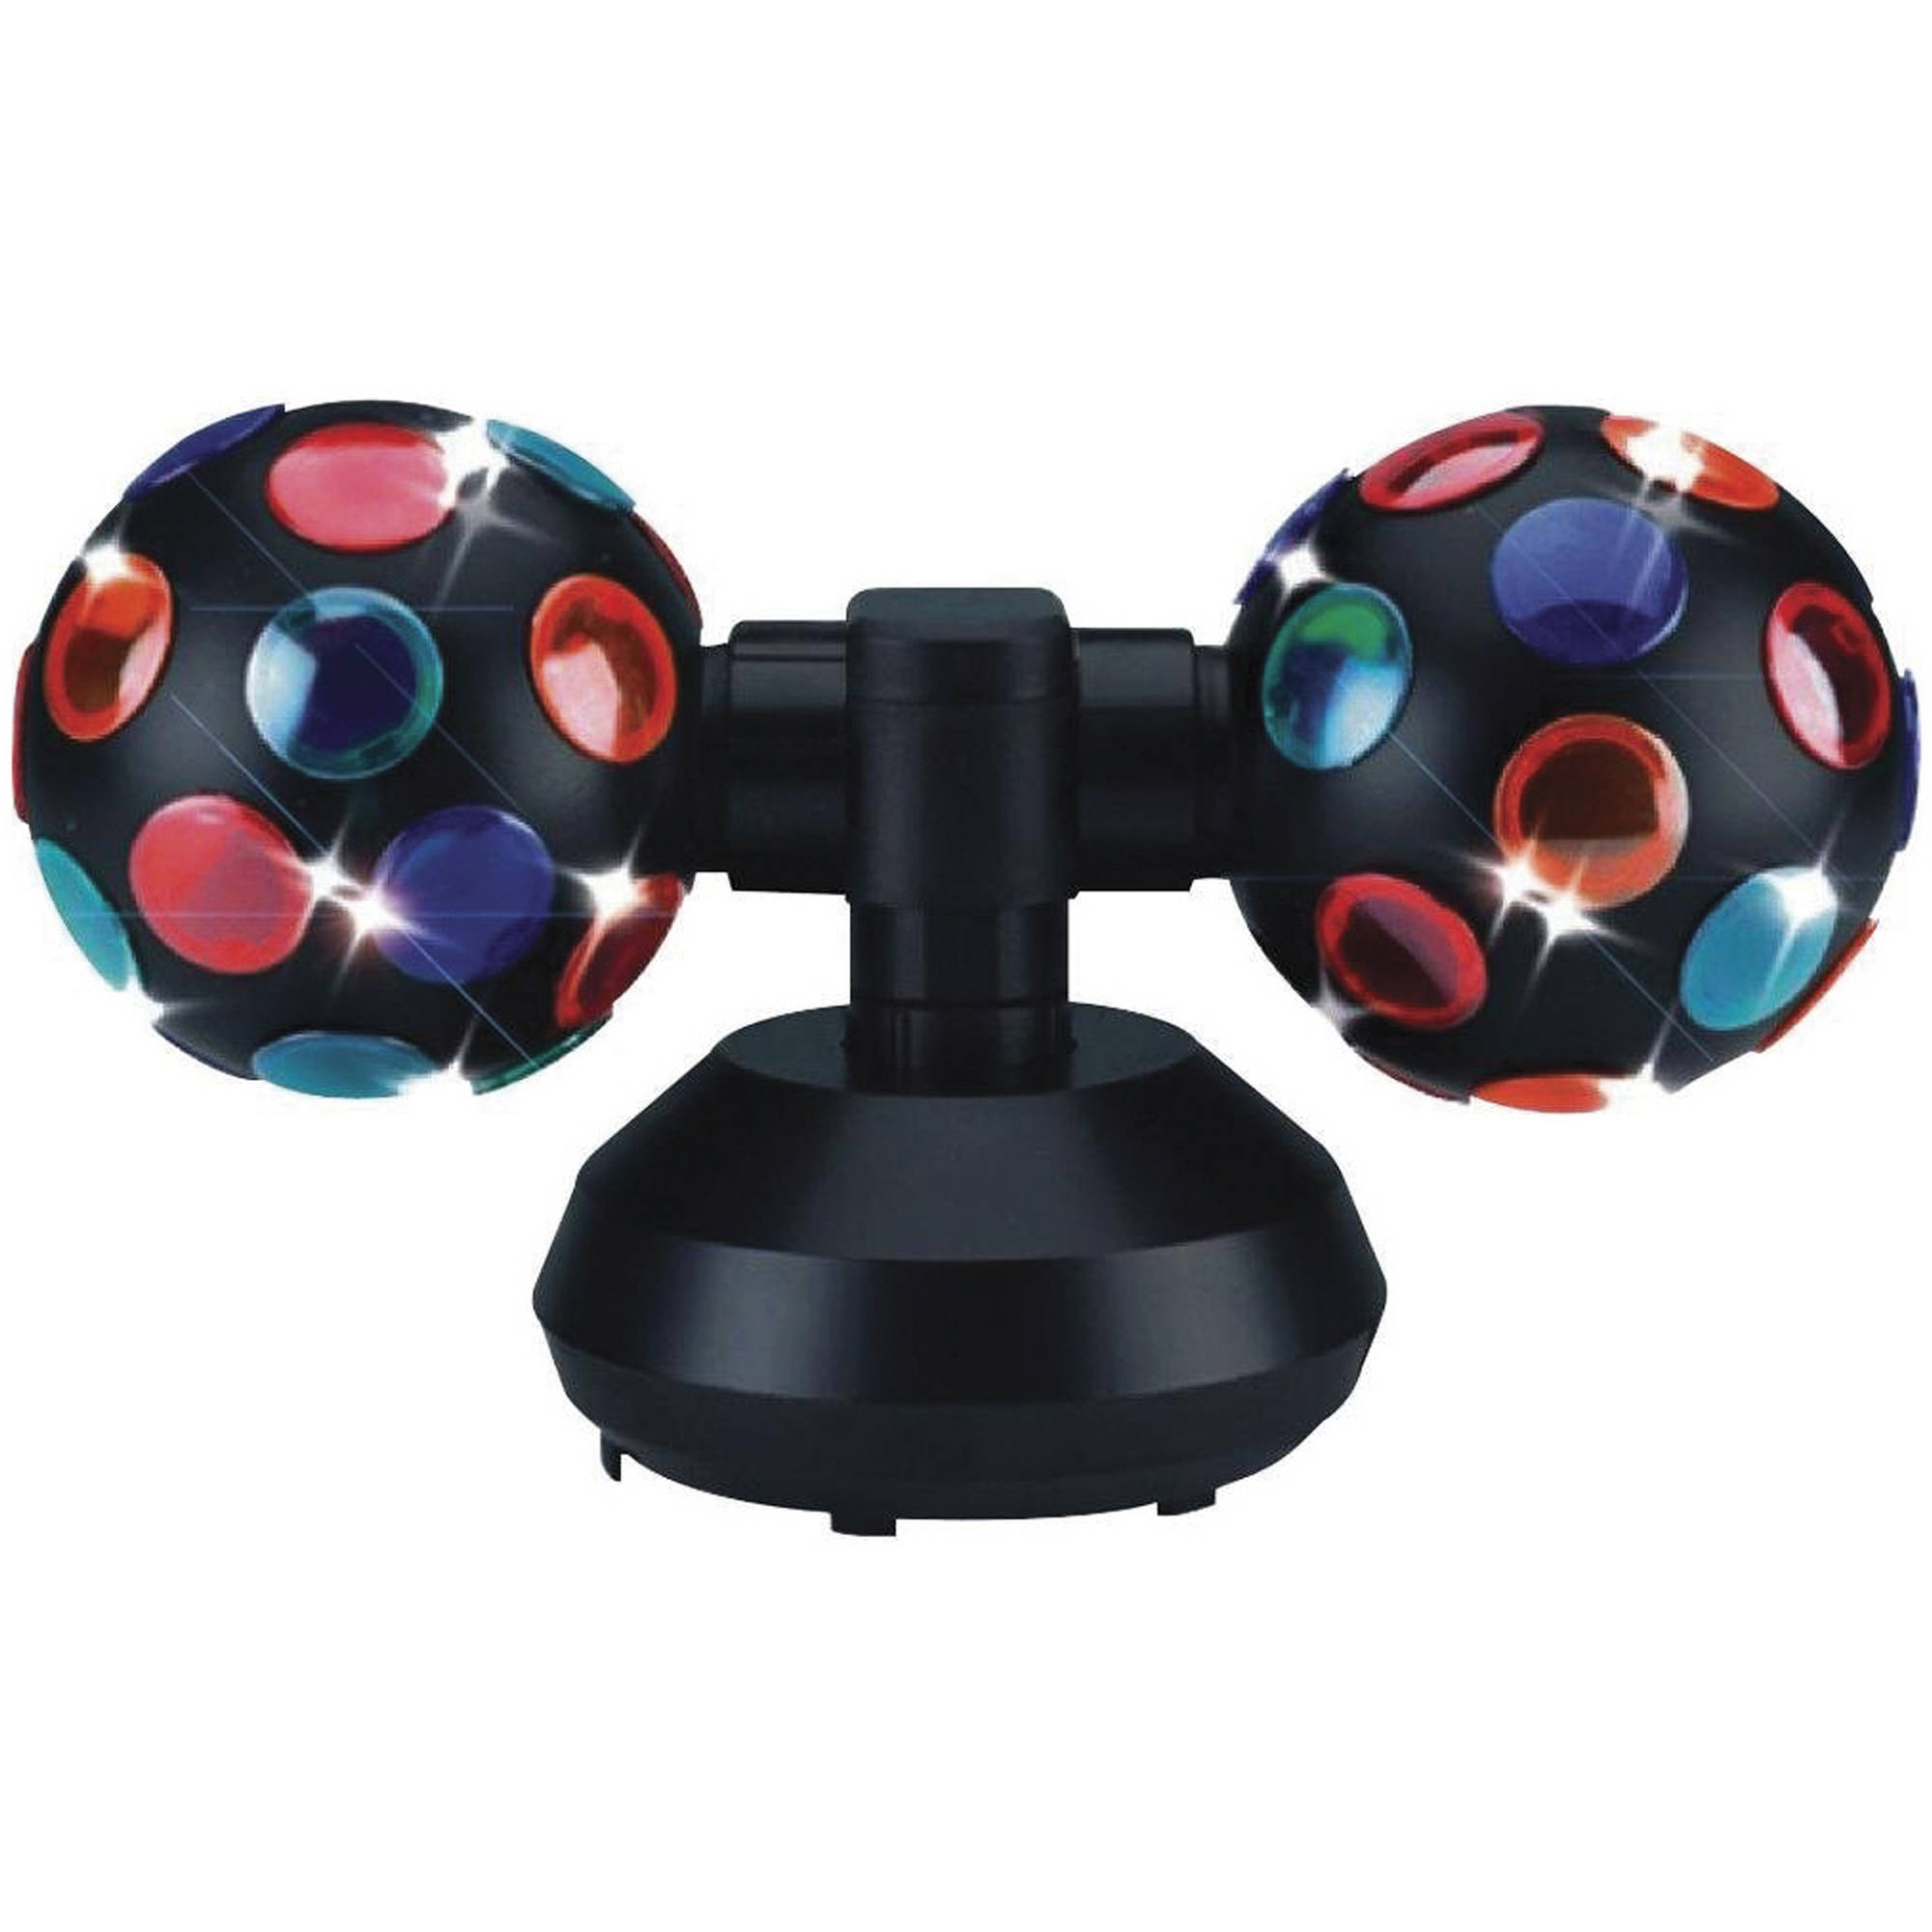 Double Disco Ball Jr by VEI